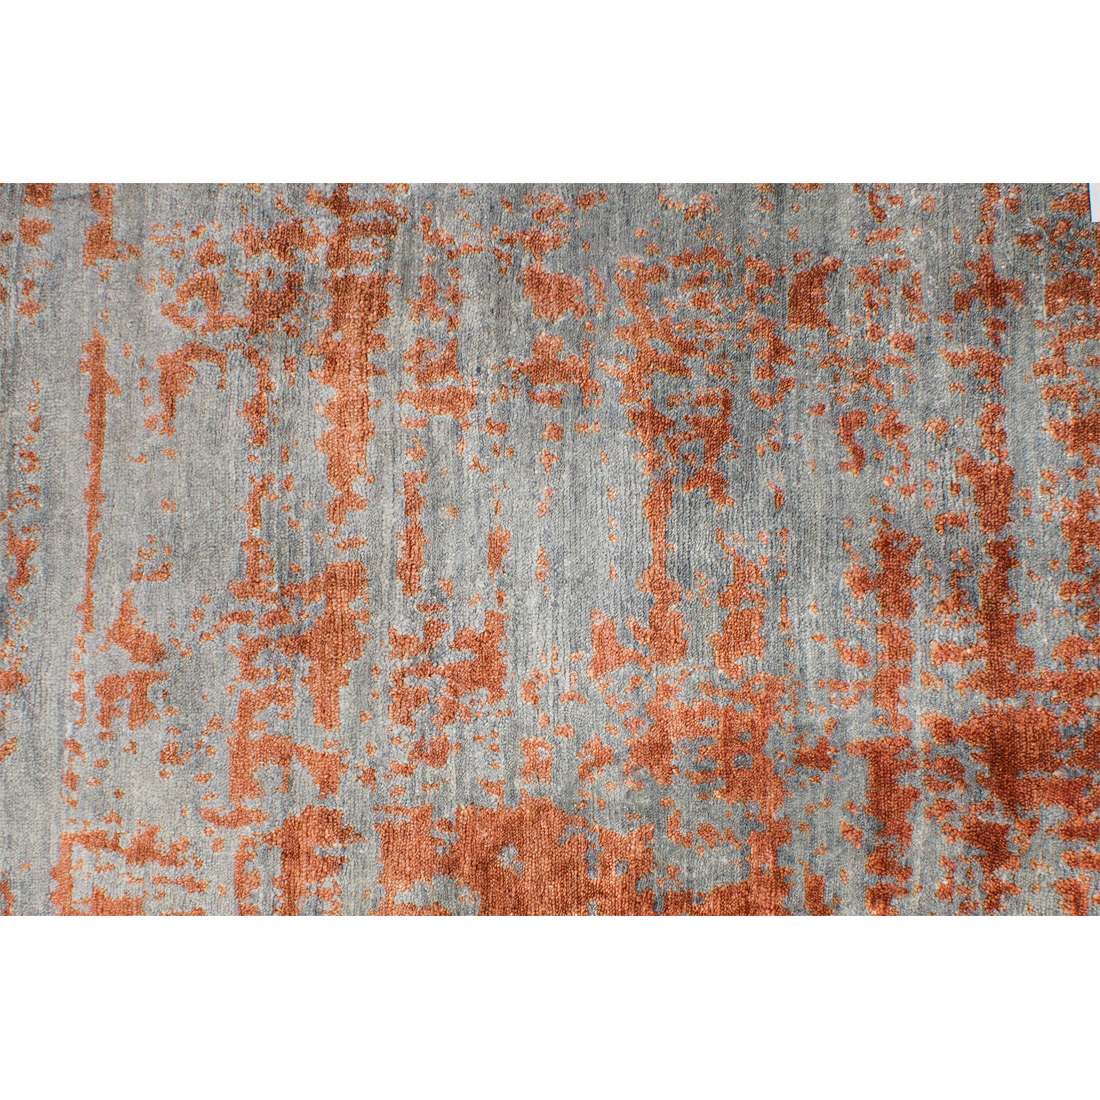 Vloerkleed Xilento Bamboo Grey Orange | 240 x 340 cm